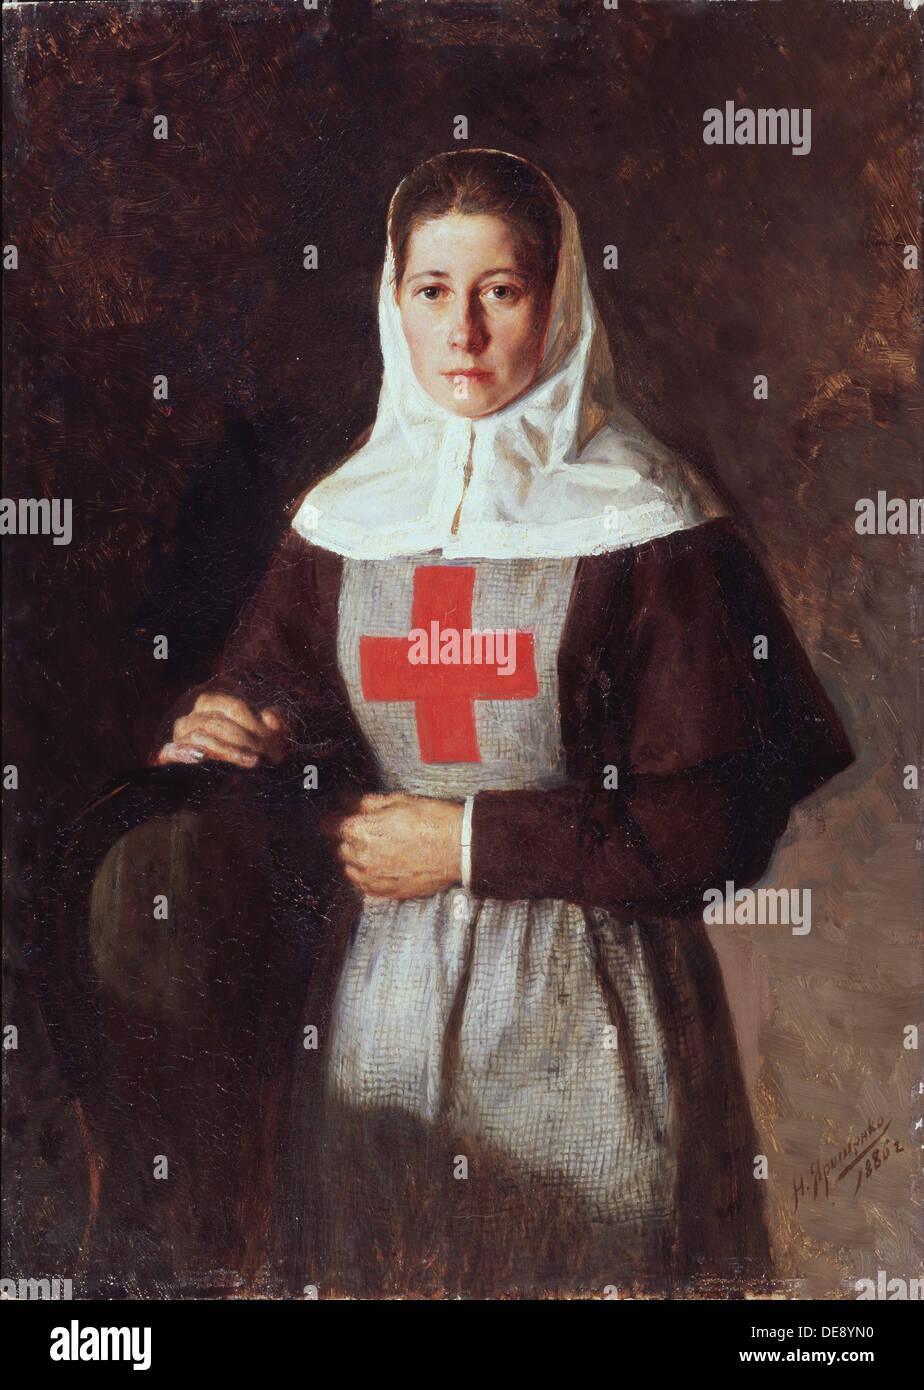 A nurse, 1886. Artist: Yaroshenko, Nikolai Alexandrovich (1846-1898) - Stock Image